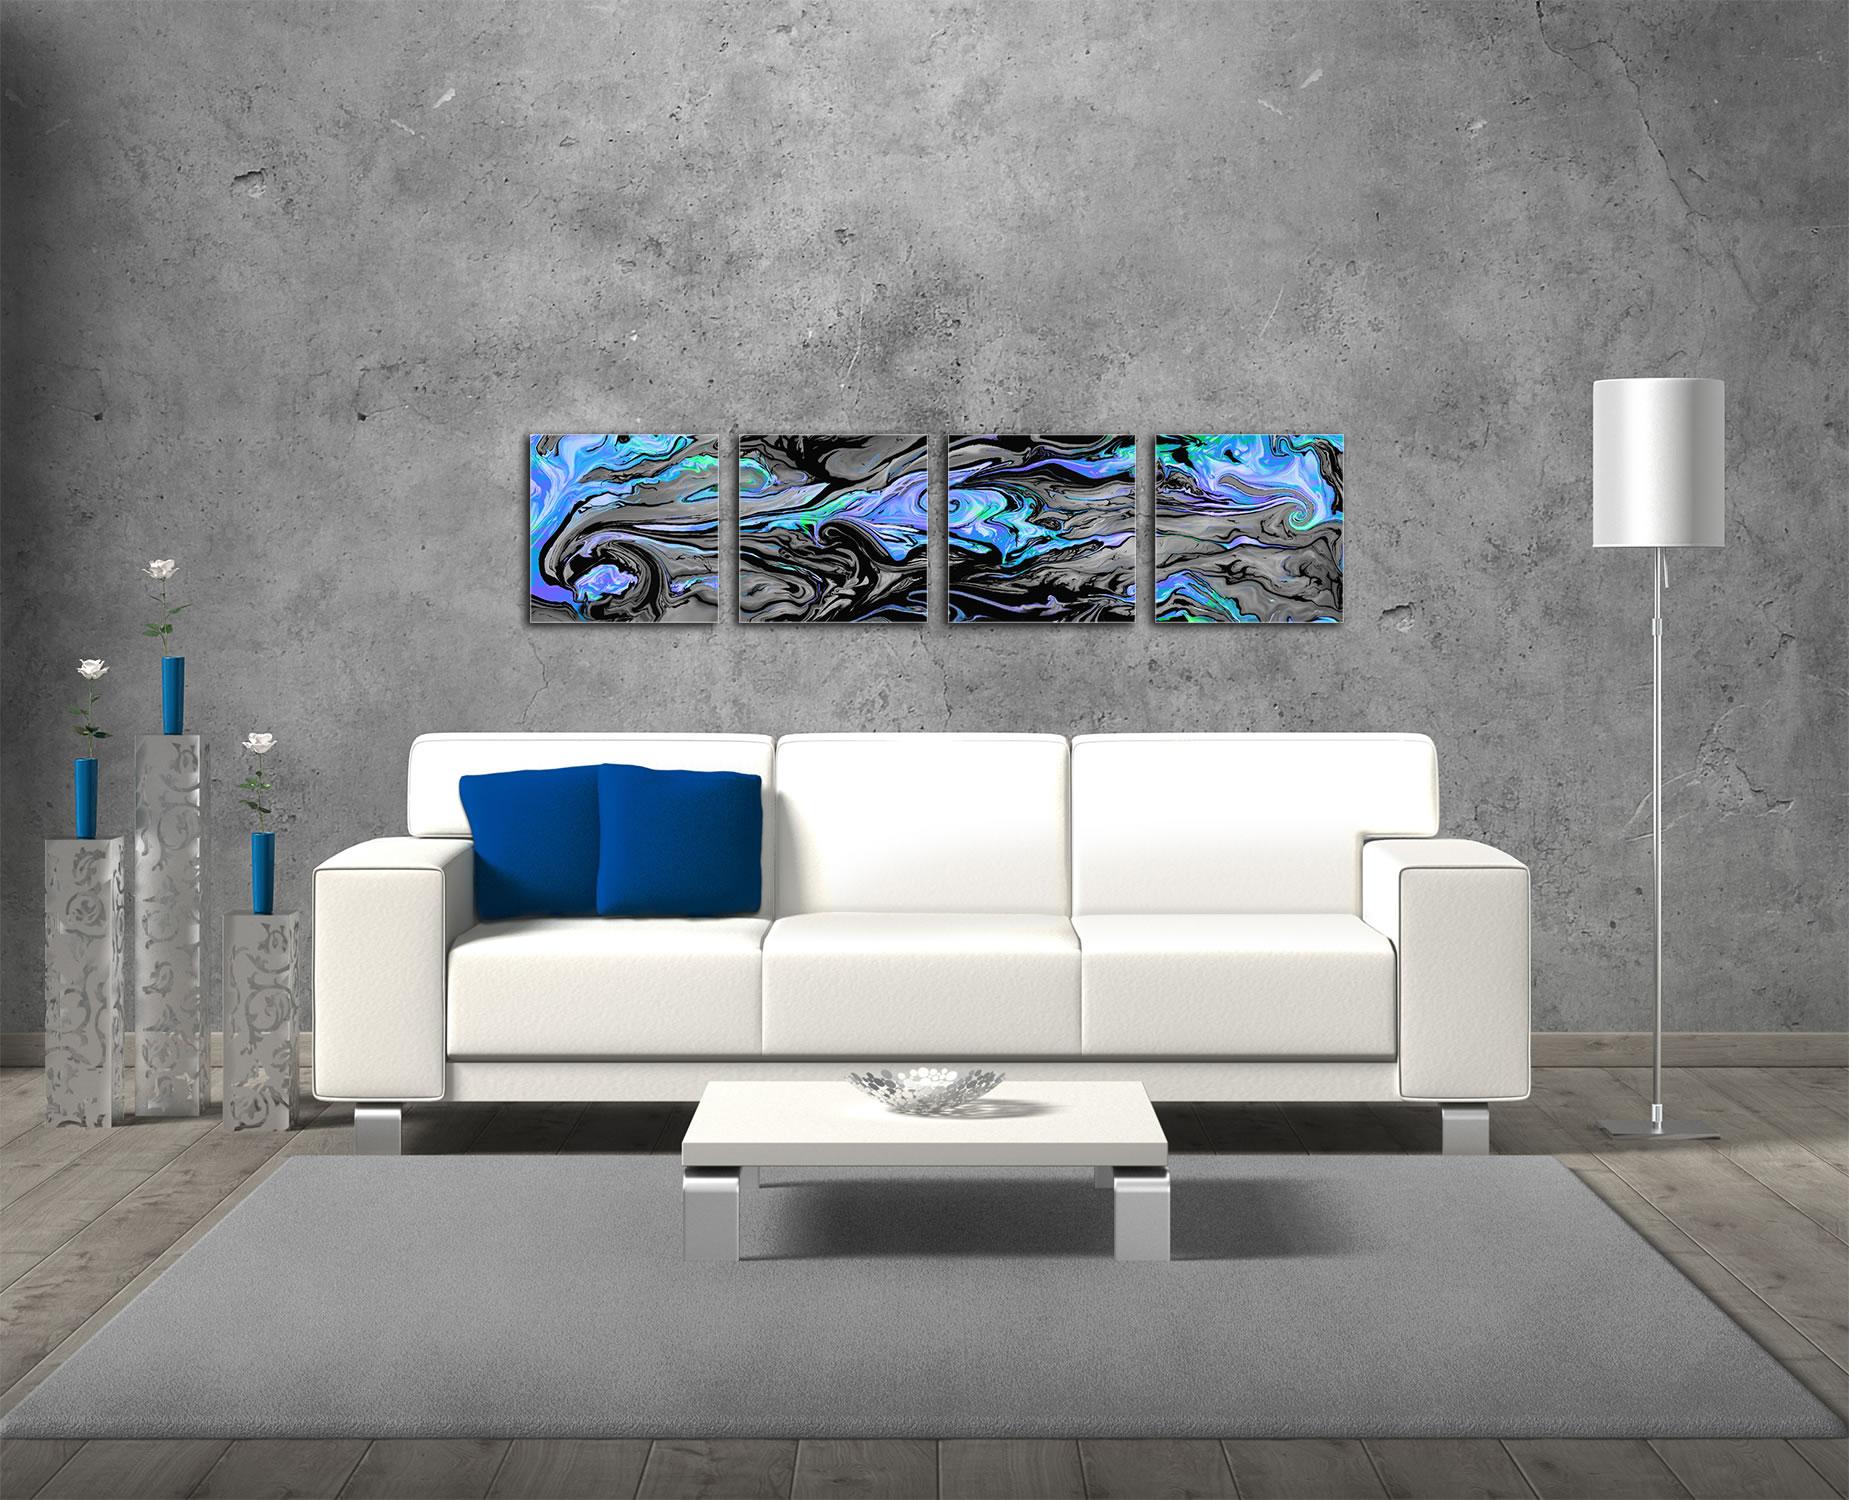 Lava Blue - Reverse-Print Acrylic Abstract Art - Lifestyle Image